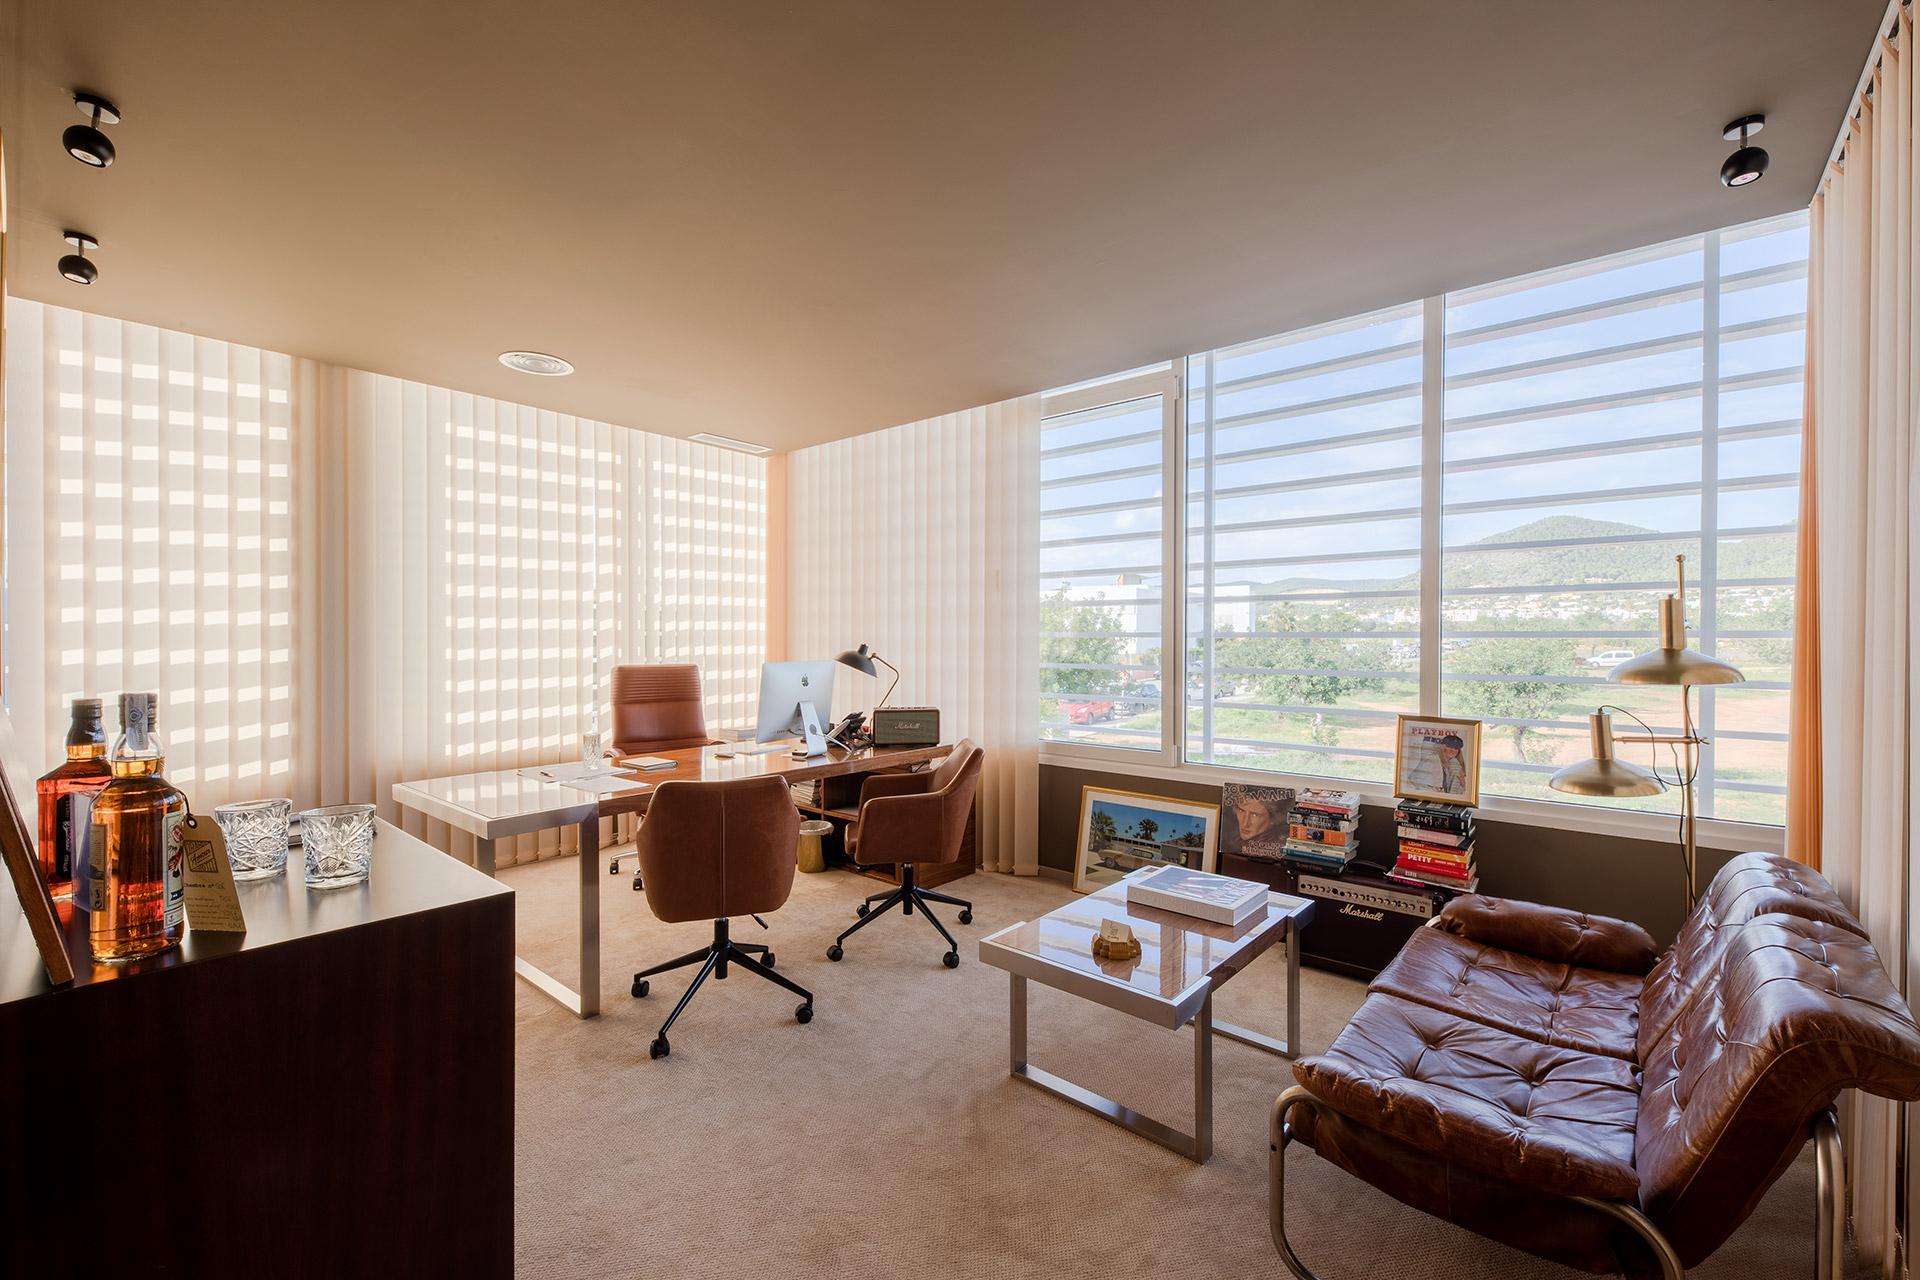 OFICINAS CONCEPT HOTEL GROUP IBIZA  Diseño: Ilmio design   Superficie: 250 m2   Situación:  Ibiza    Año:  2018    Fotografia:  Salva Carbó